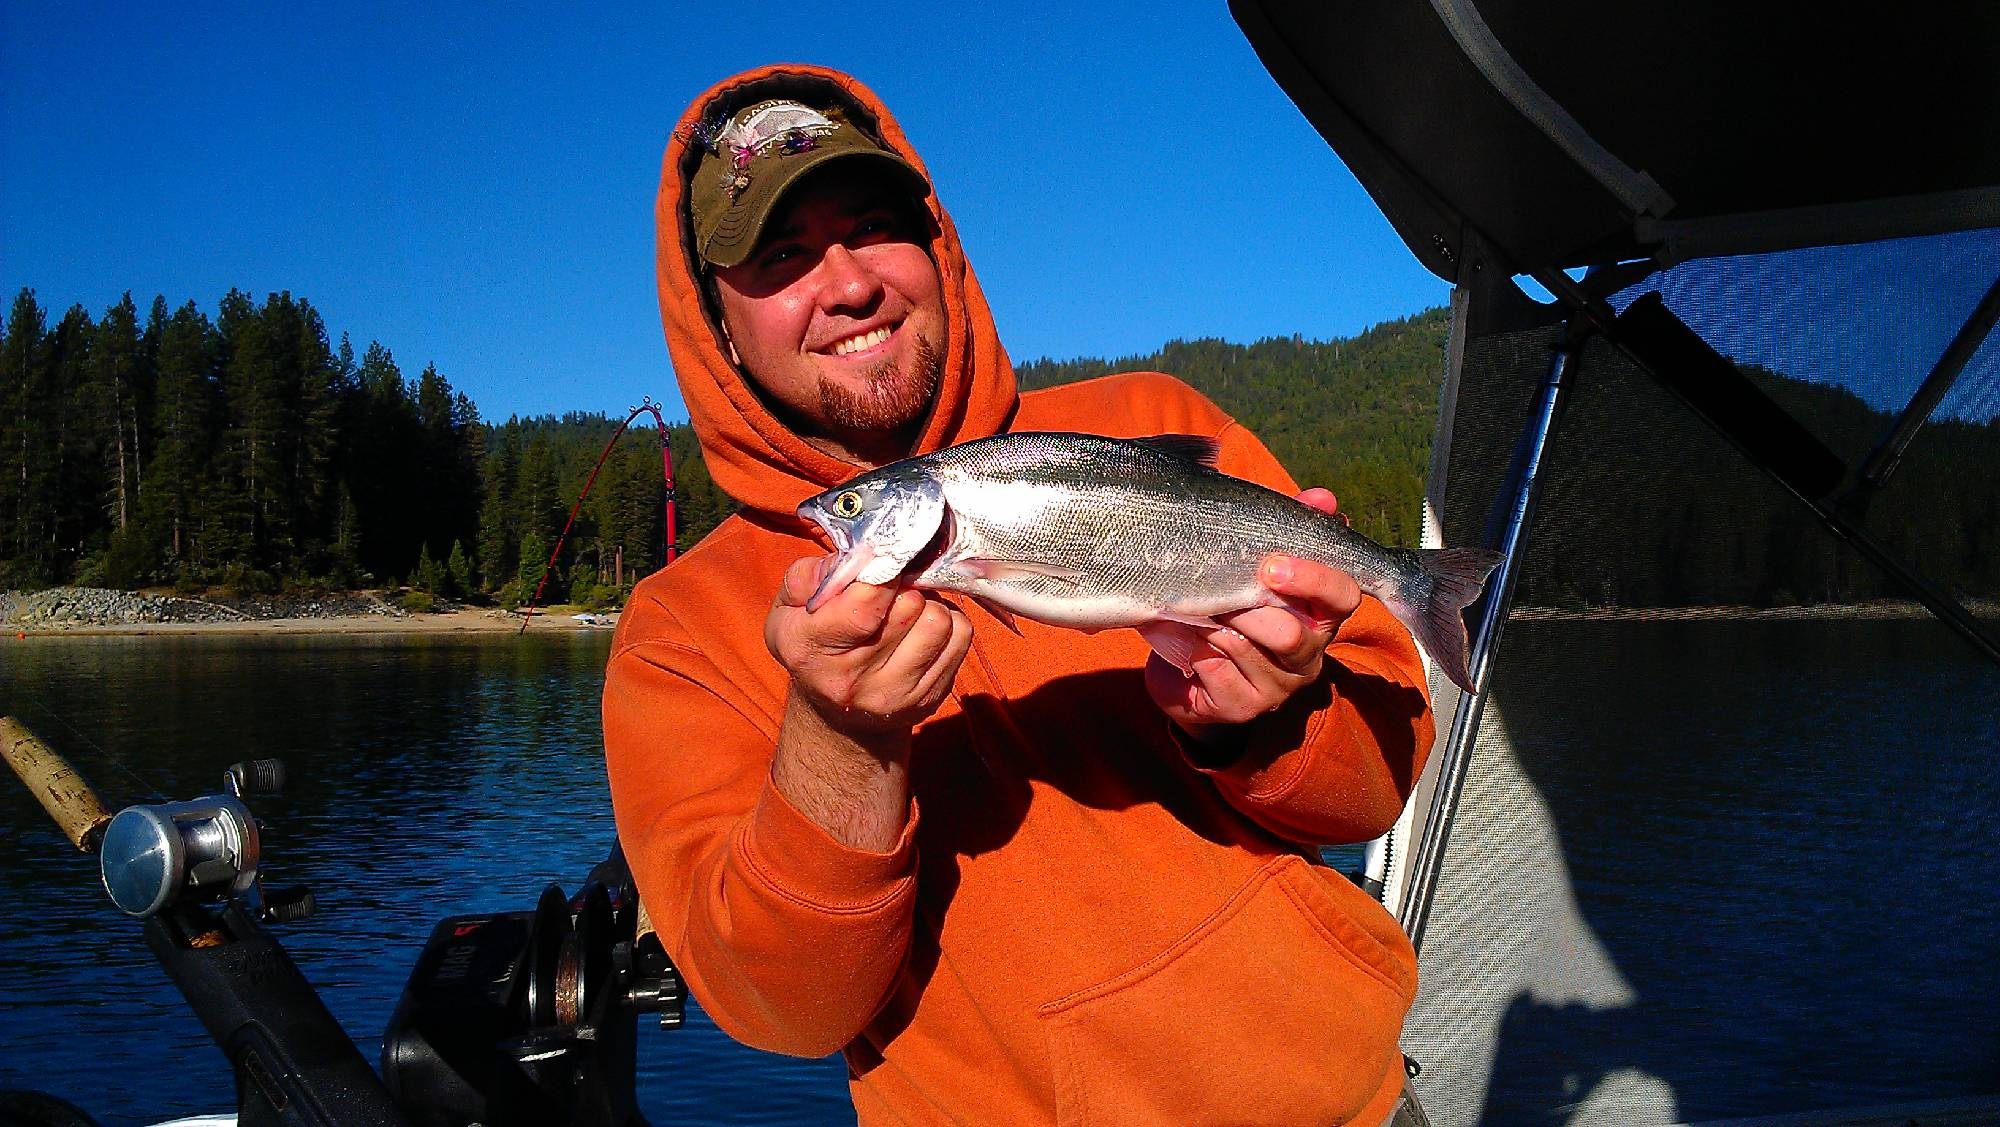 Bass Lake Fishing Professional Guided Charter Fishing